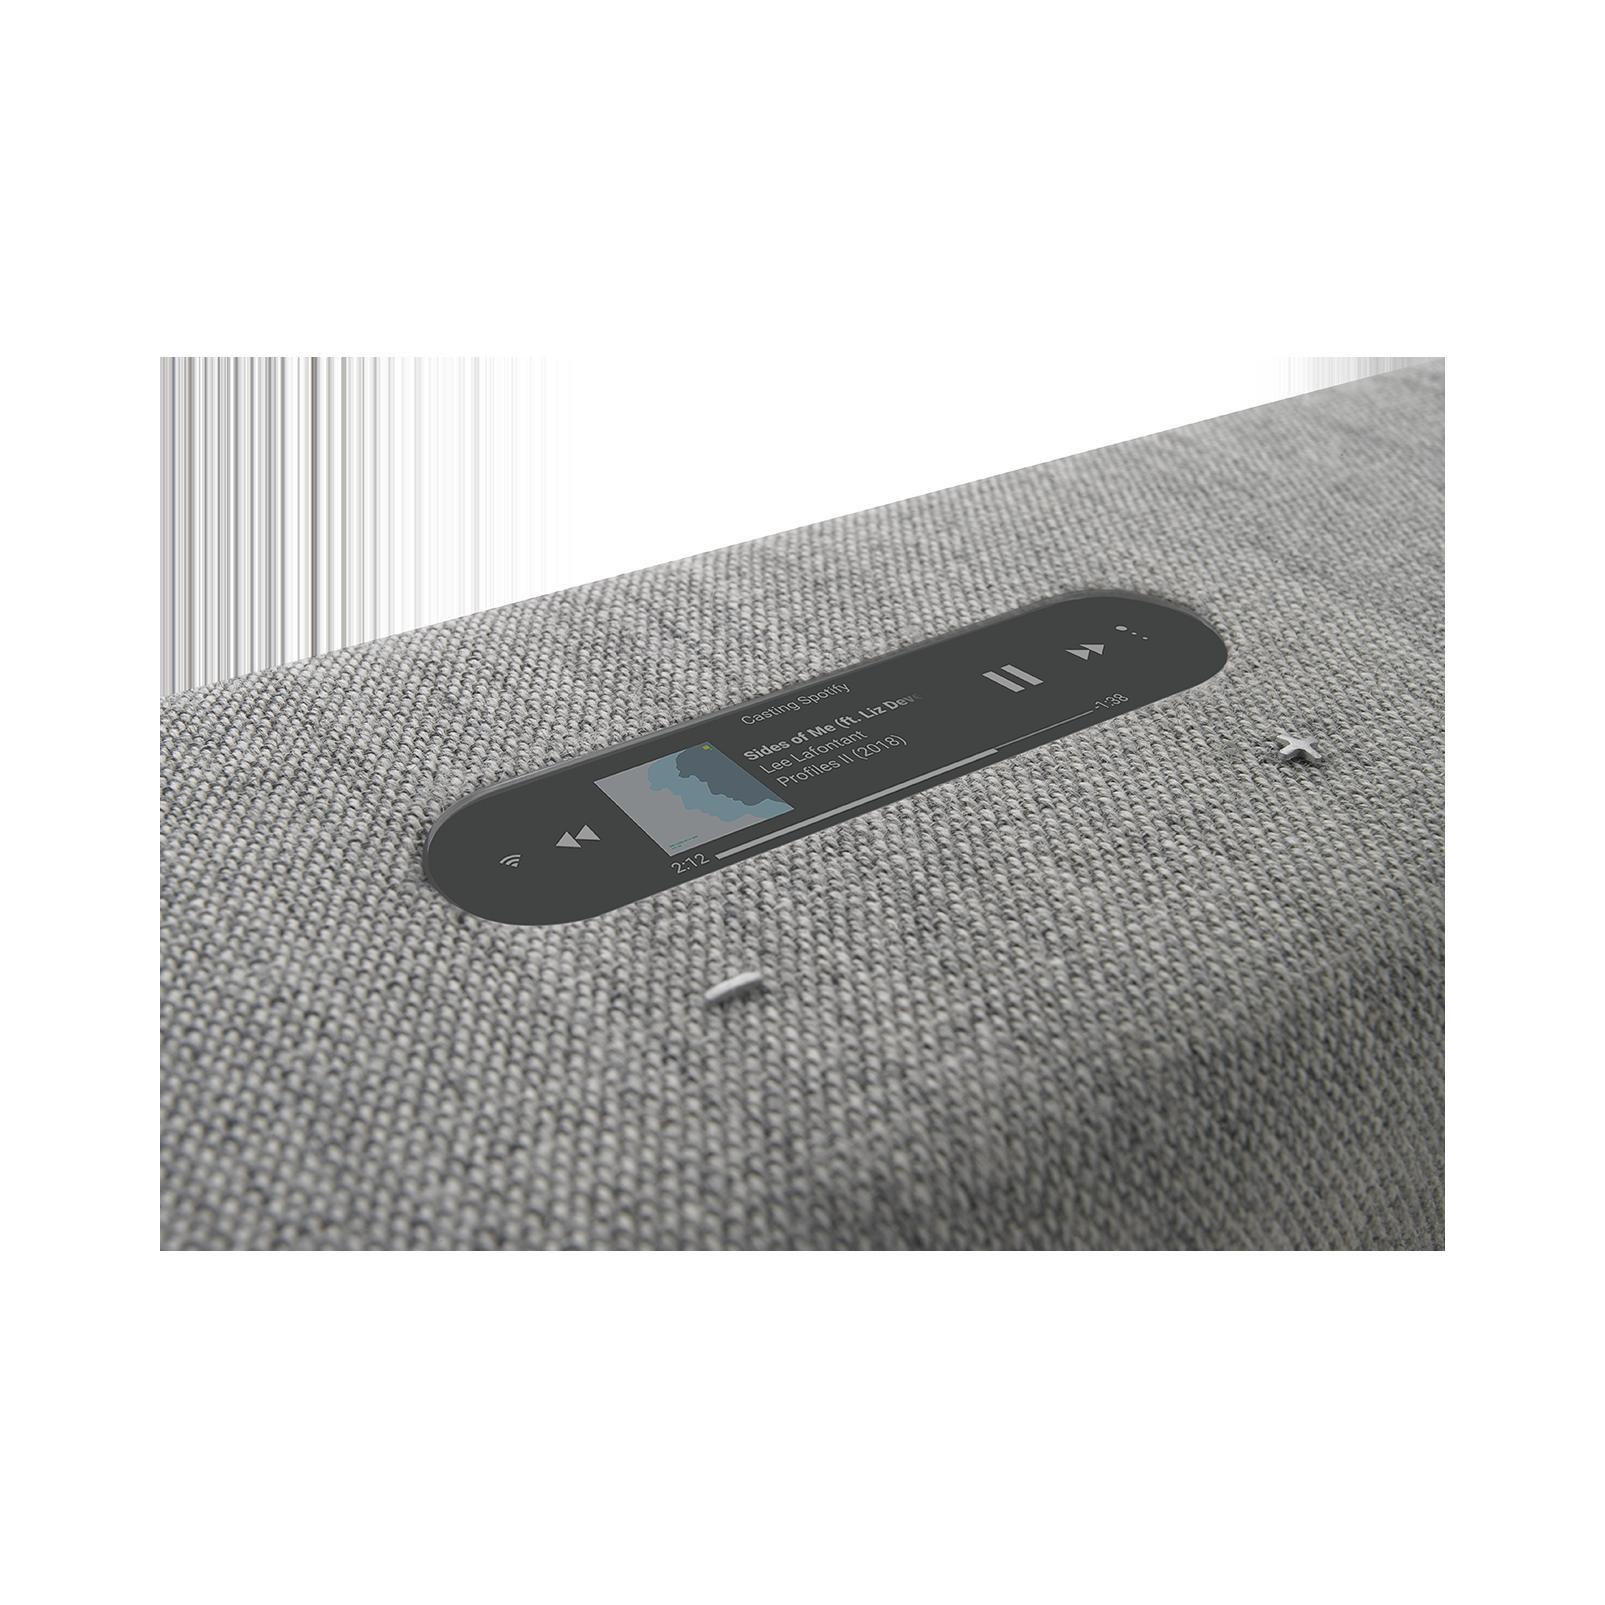 Harman Kardon Citation Bar - Grey - The smartest soundbar for movies and music - Detailshot 1